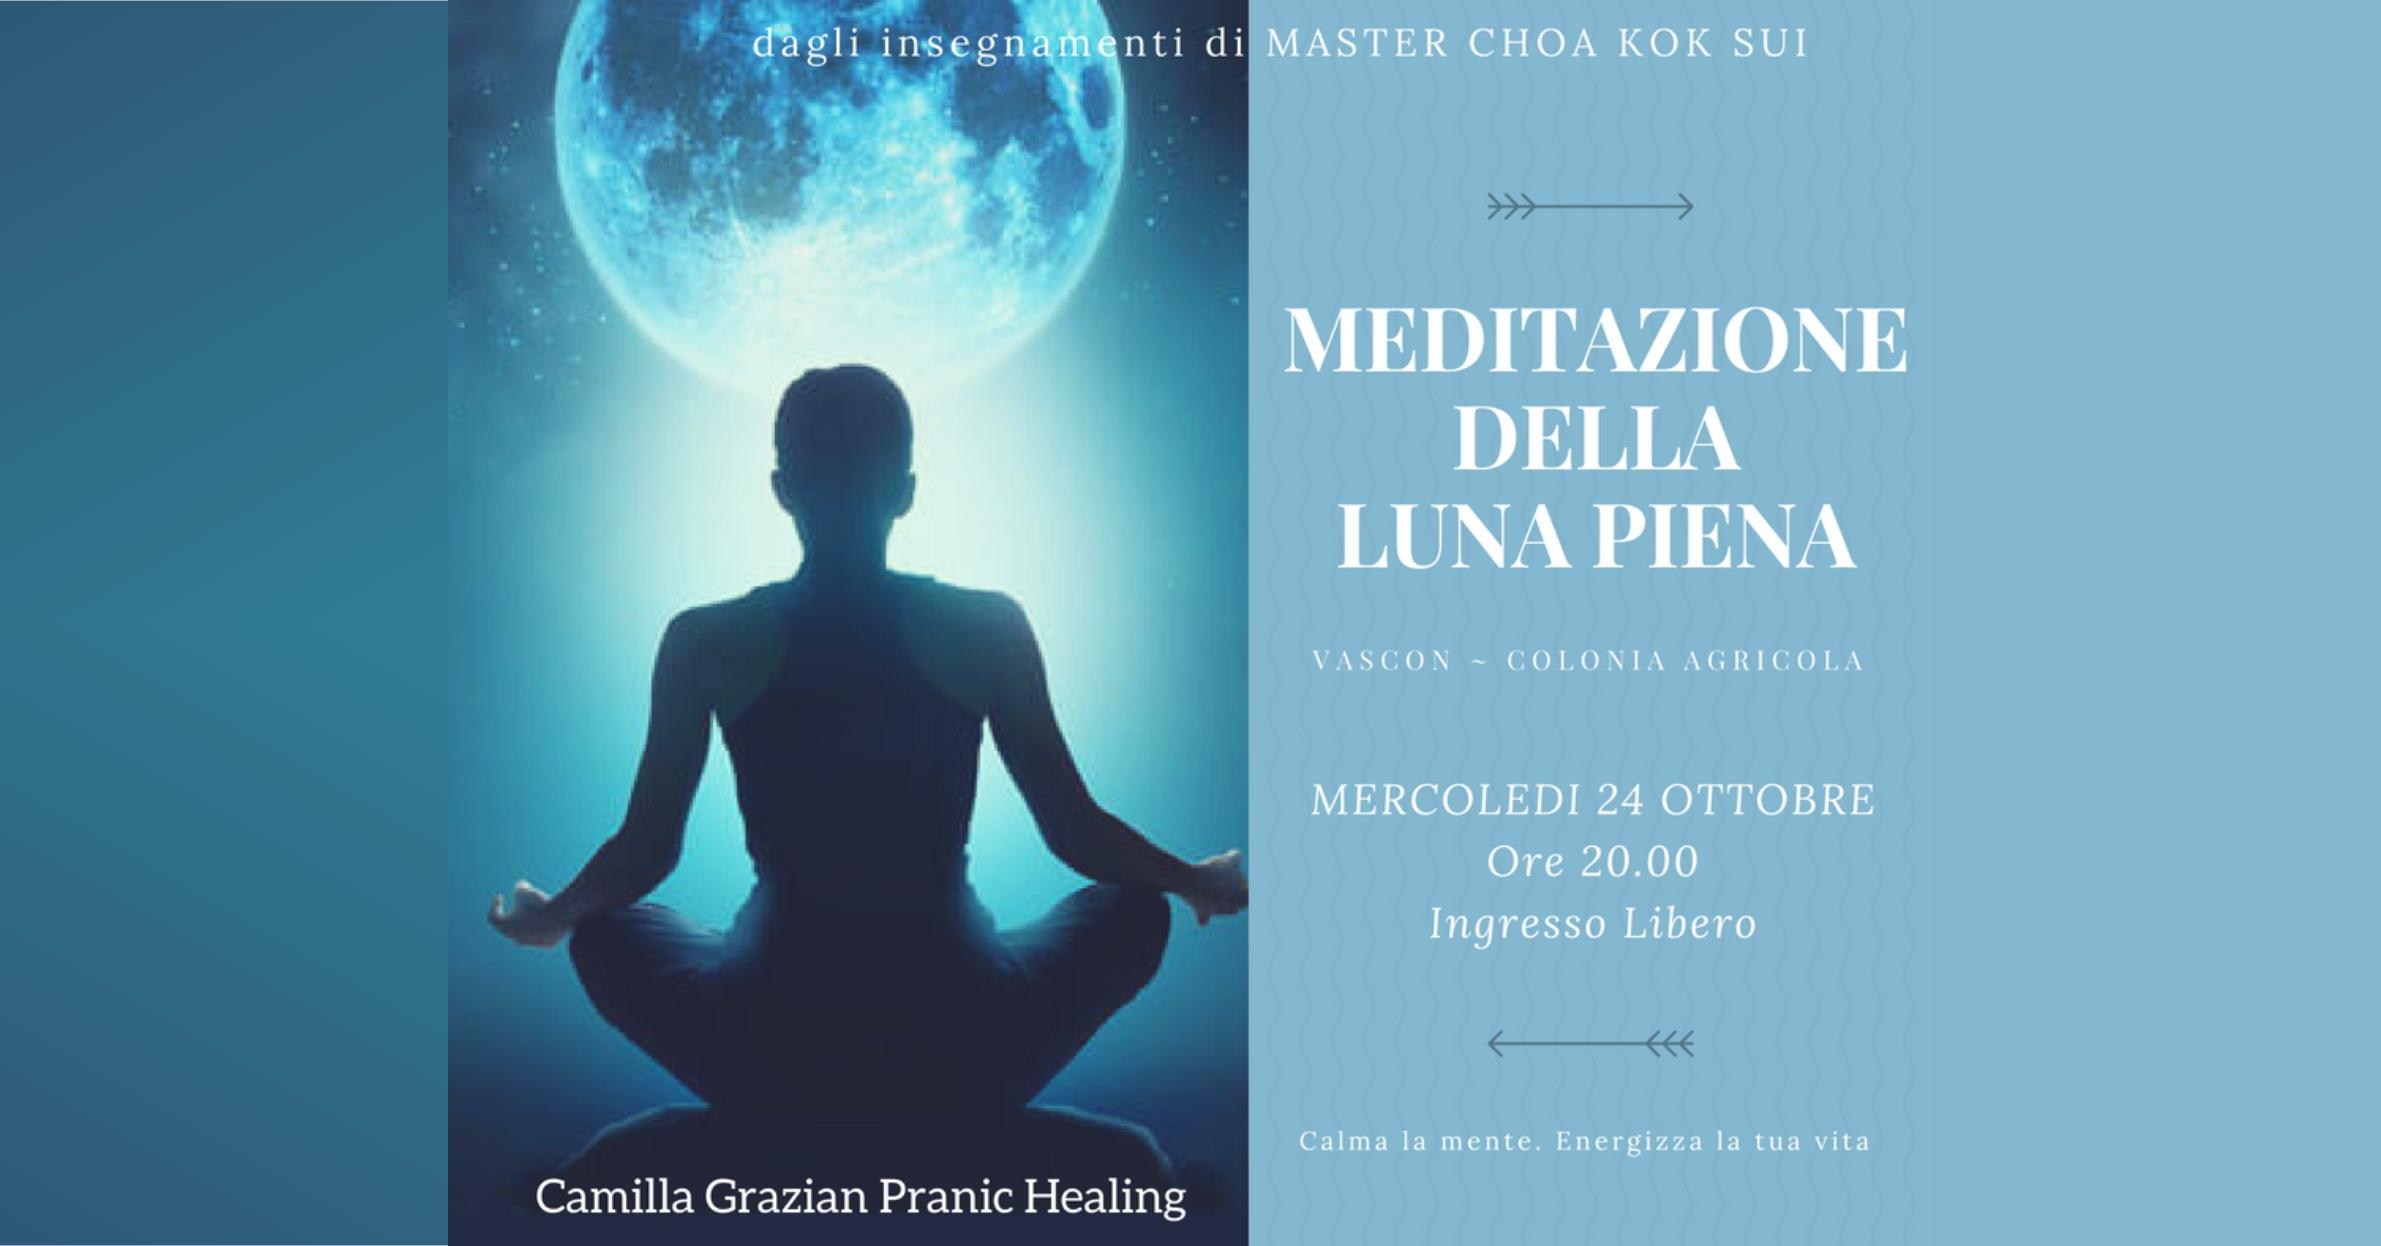 MeditazioneLunaPiena_Social